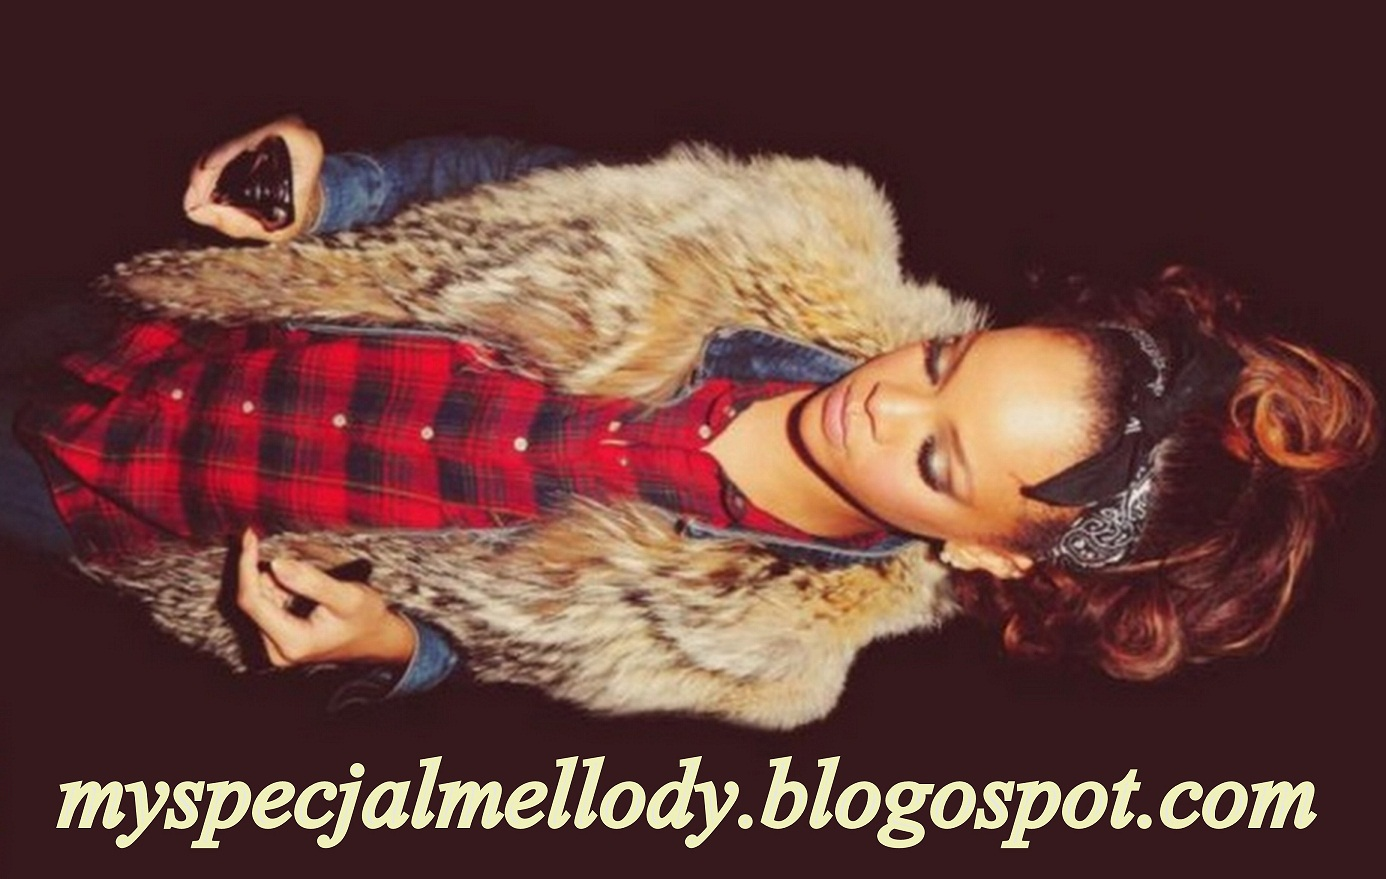 myspecjalmellody.blogspot.com